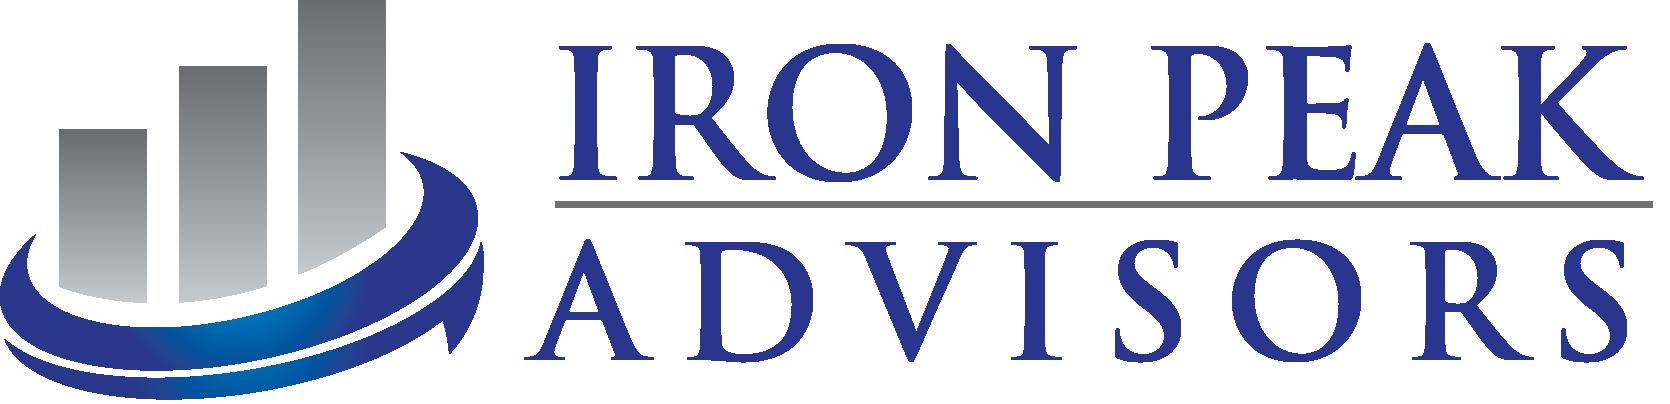 Iron Peak Advisors